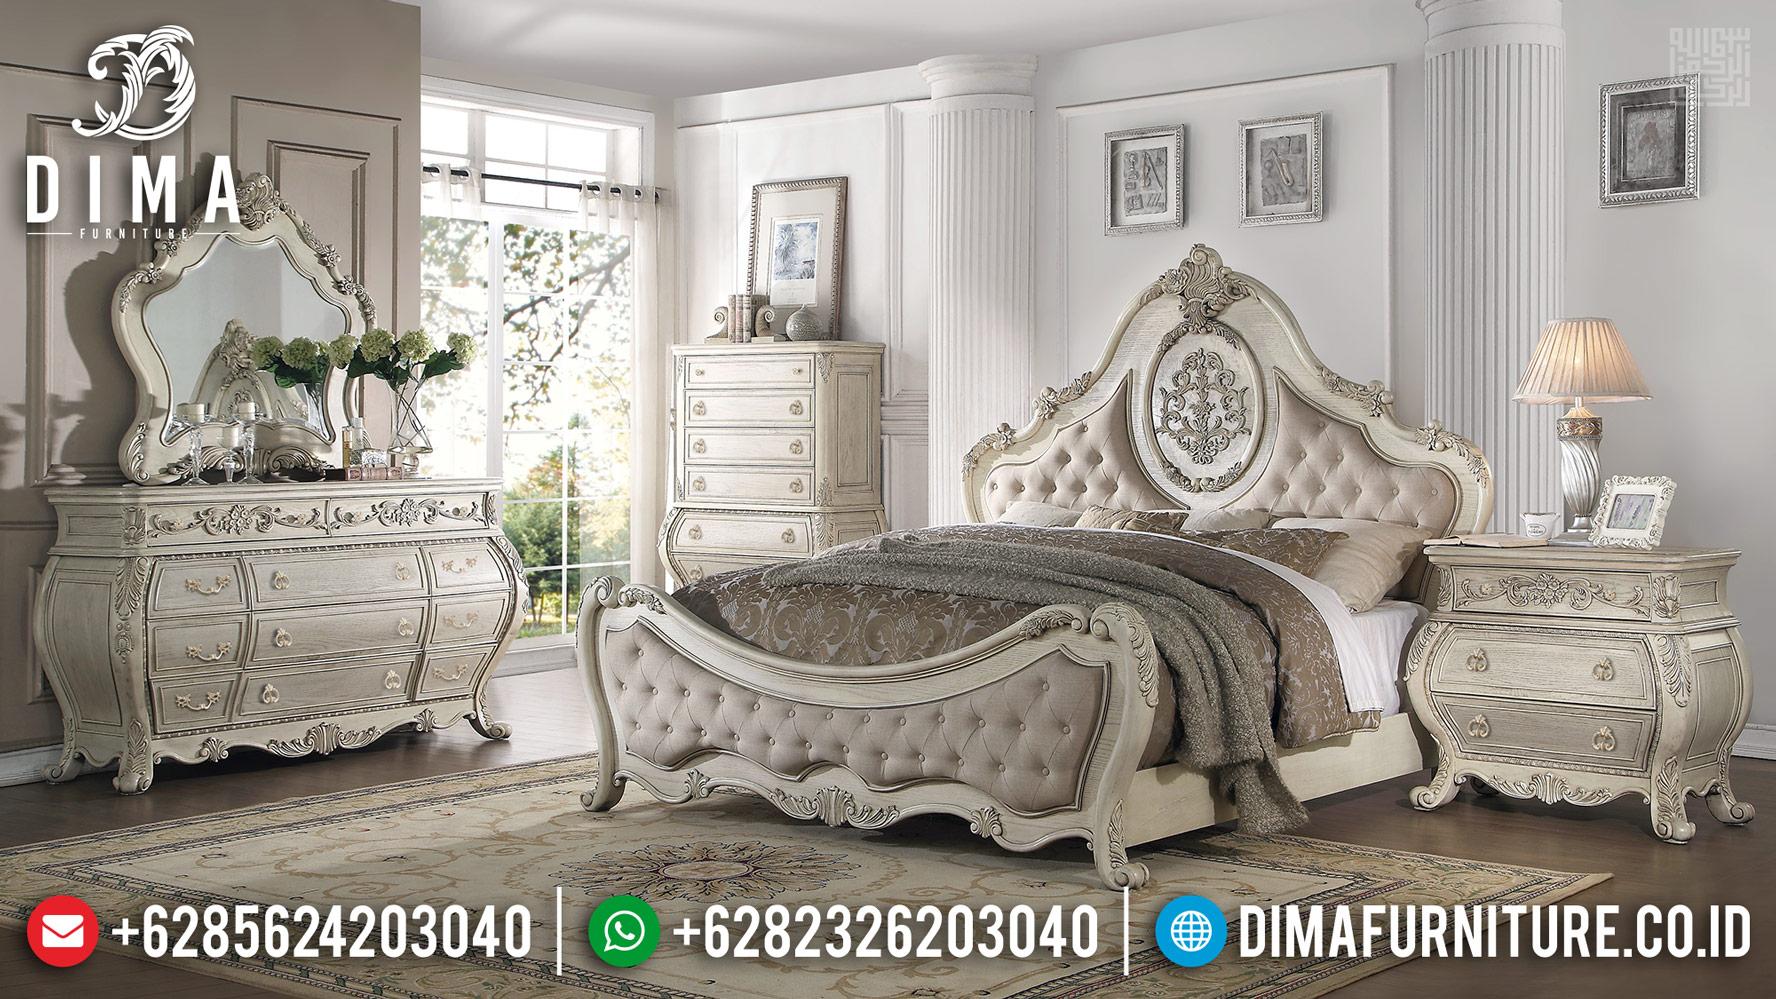 Harga Tempat Tidur Mewah New Design Luxury Classic Furniture Jepara BT-0390